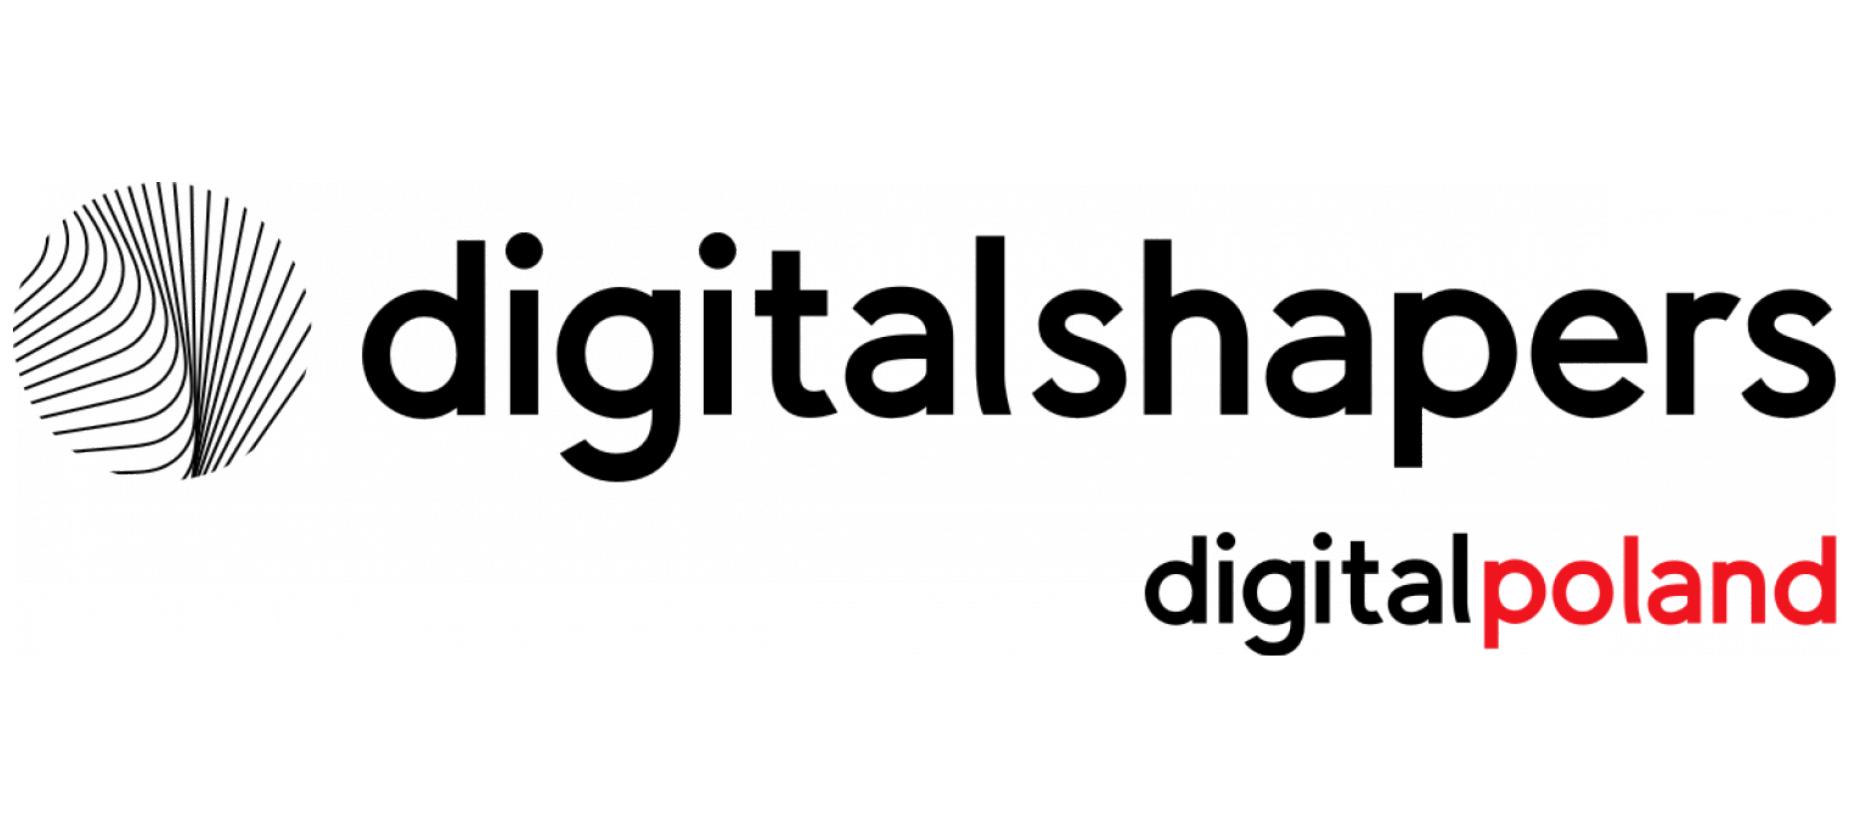 Digital Shapers Award 2018